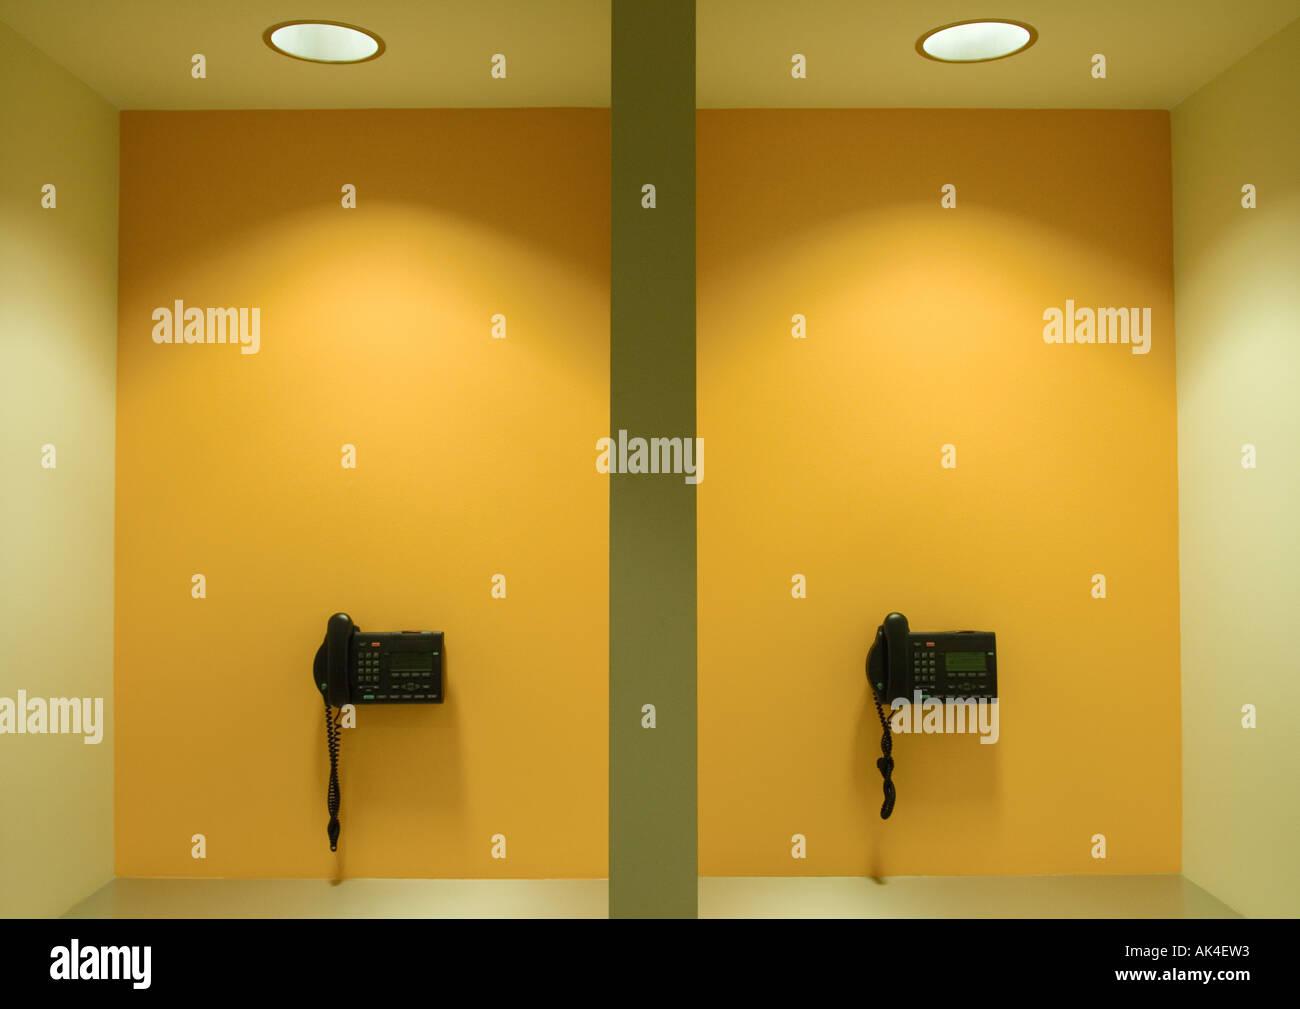 Wall phones - Stock Image